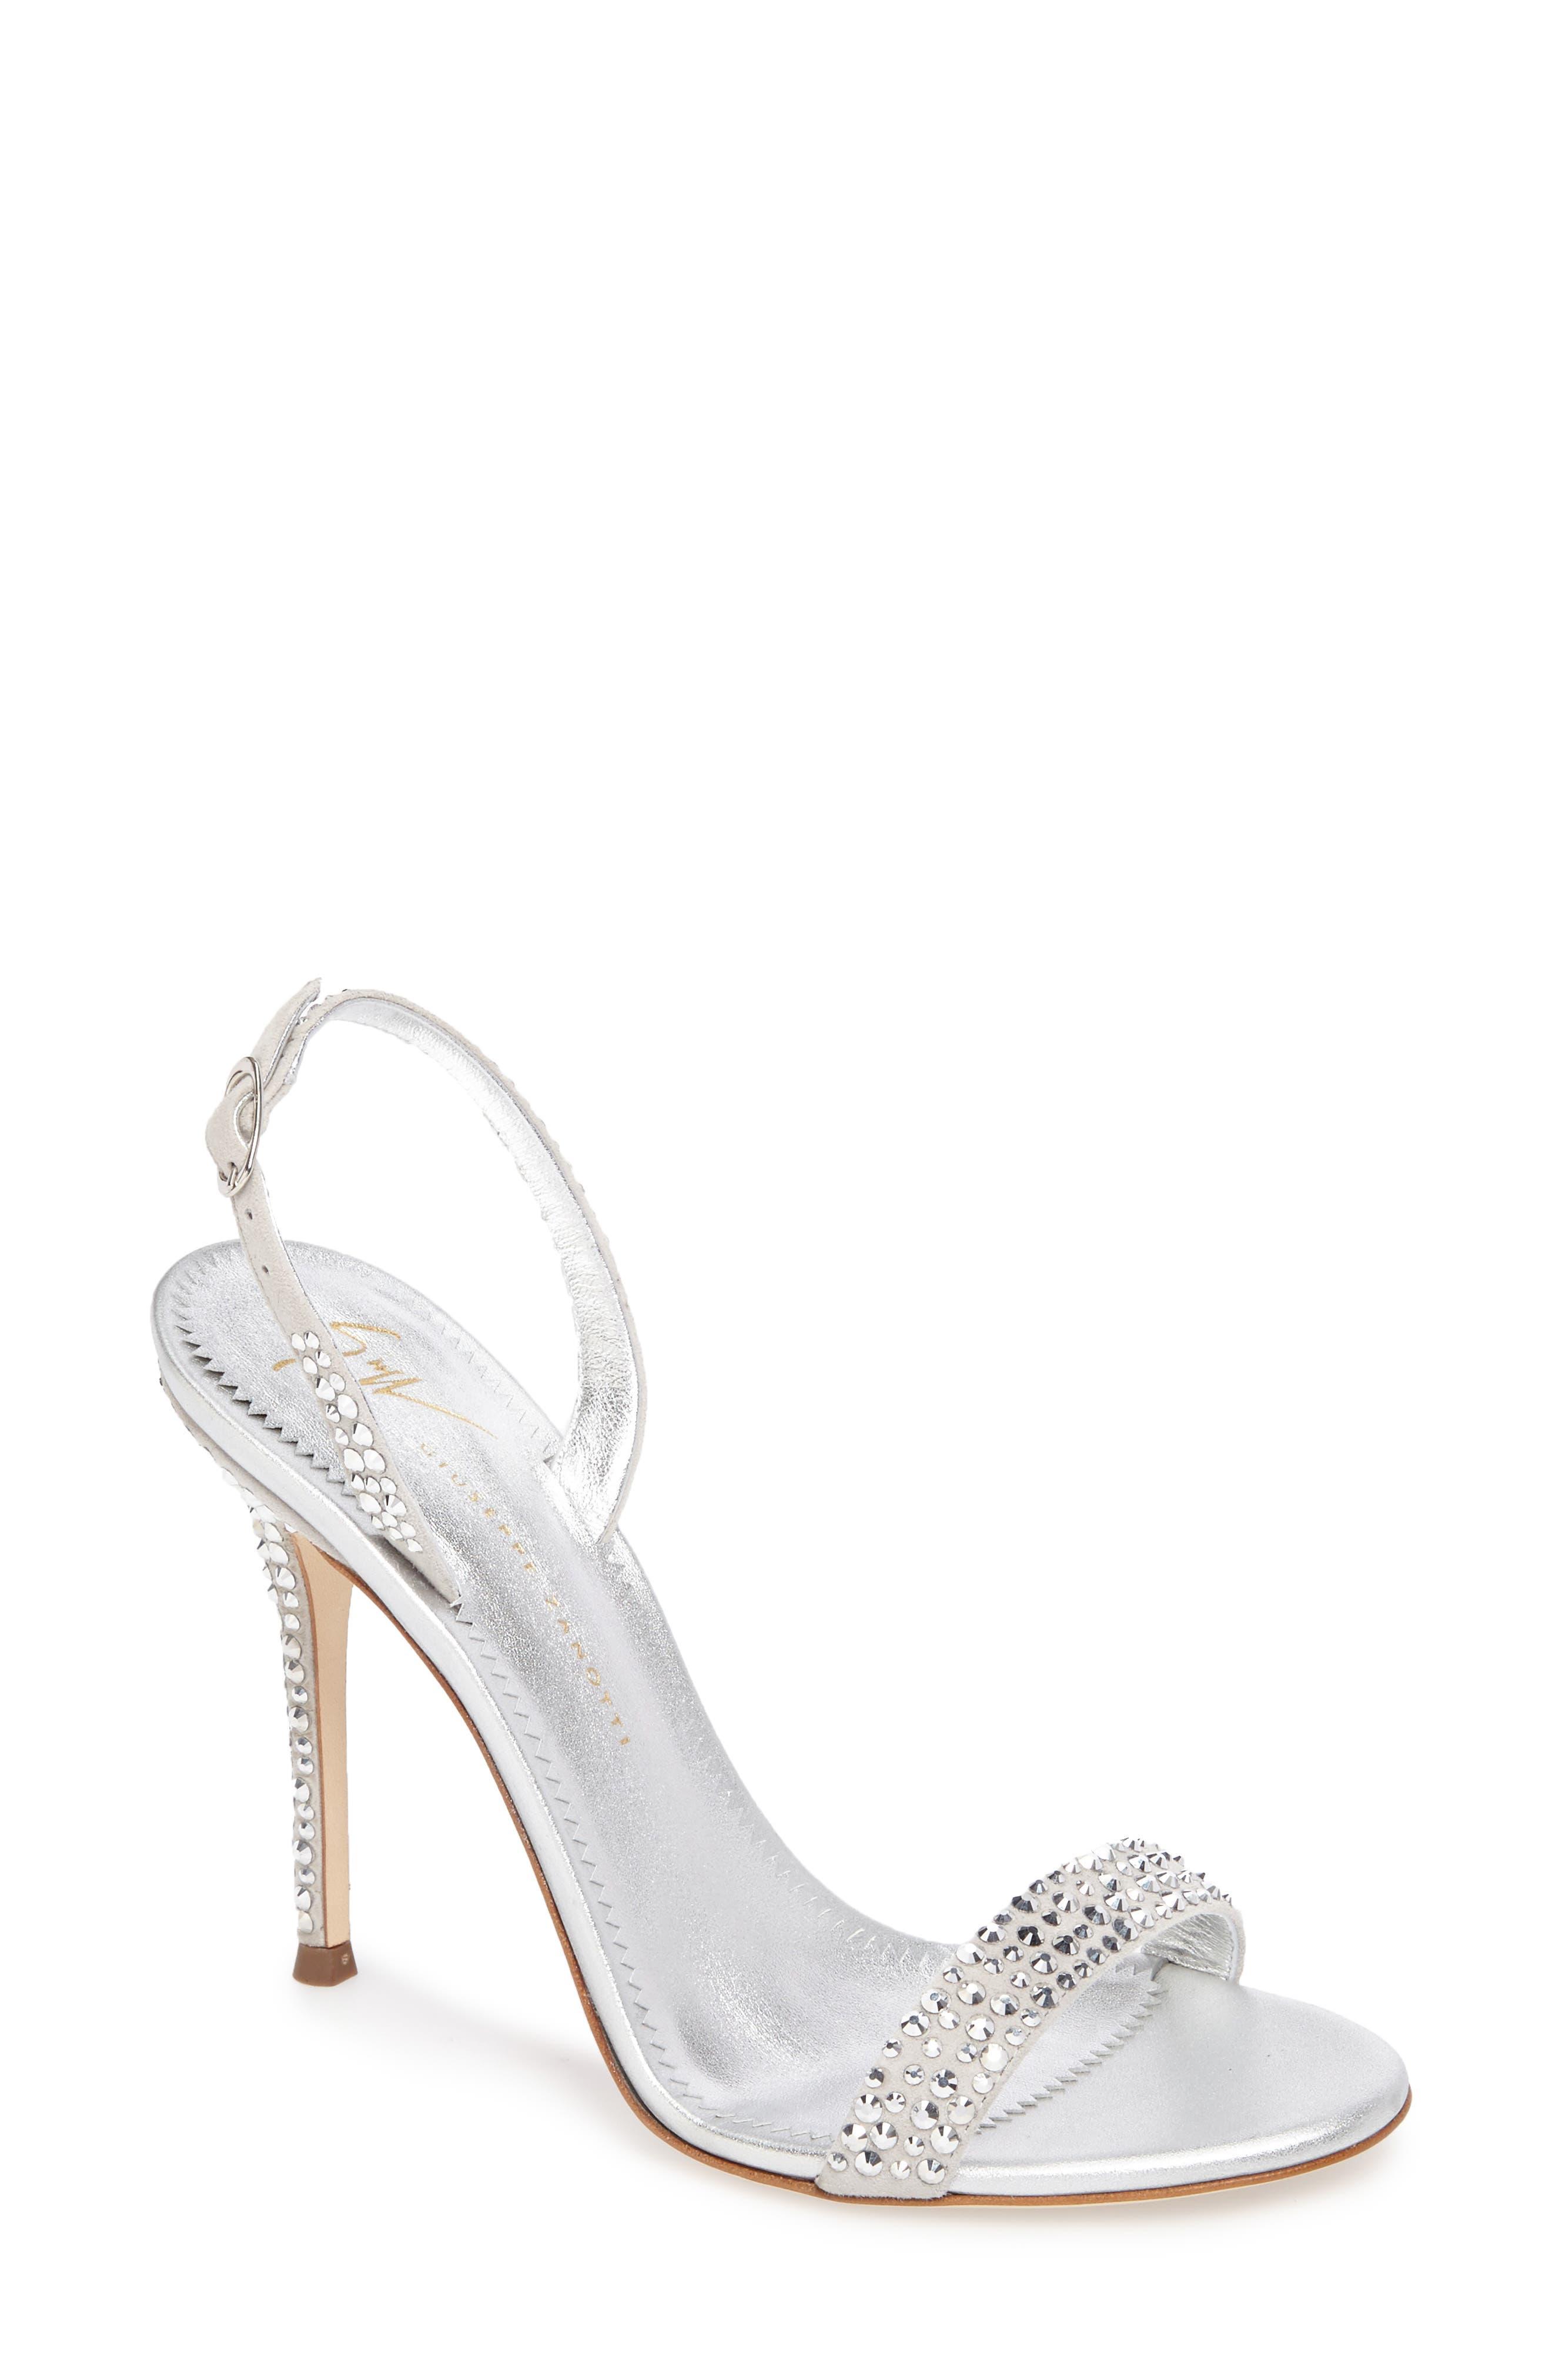 Musitco Crystal Embellished Slingback Sandal,                             Main thumbnail 1, color,                             Grey